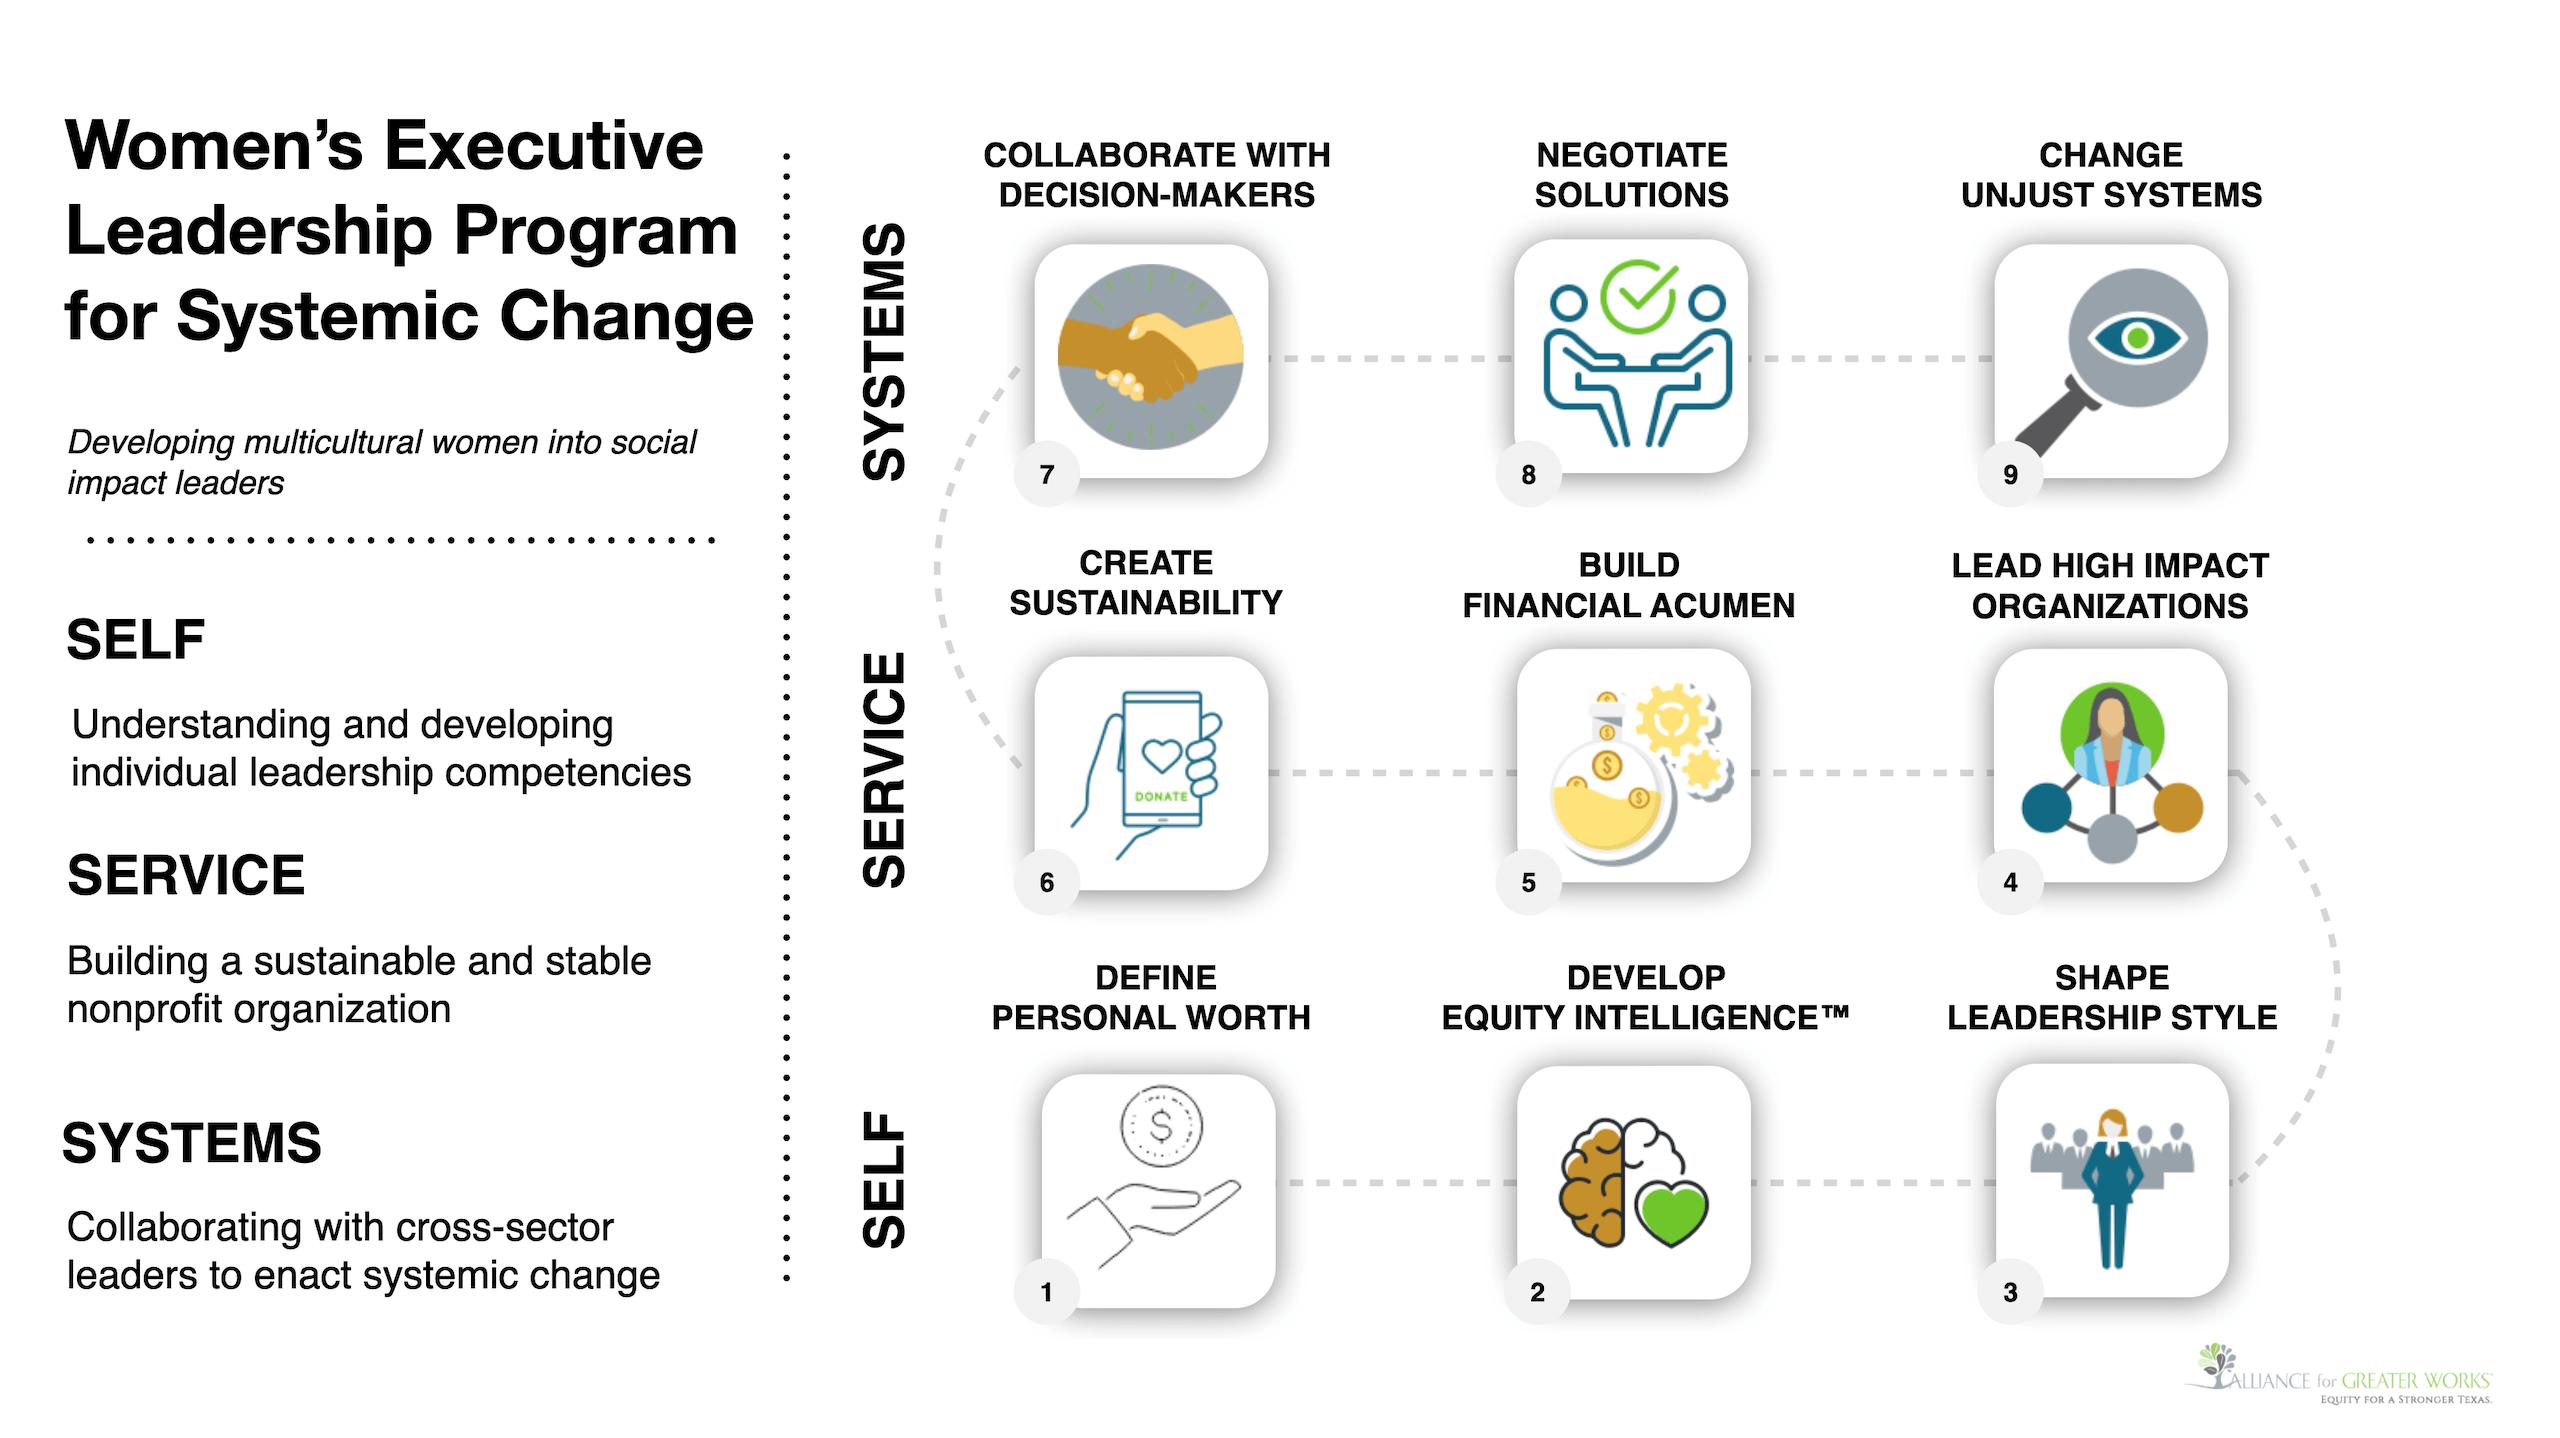 womens-executive-leadership-program-slide-compressed